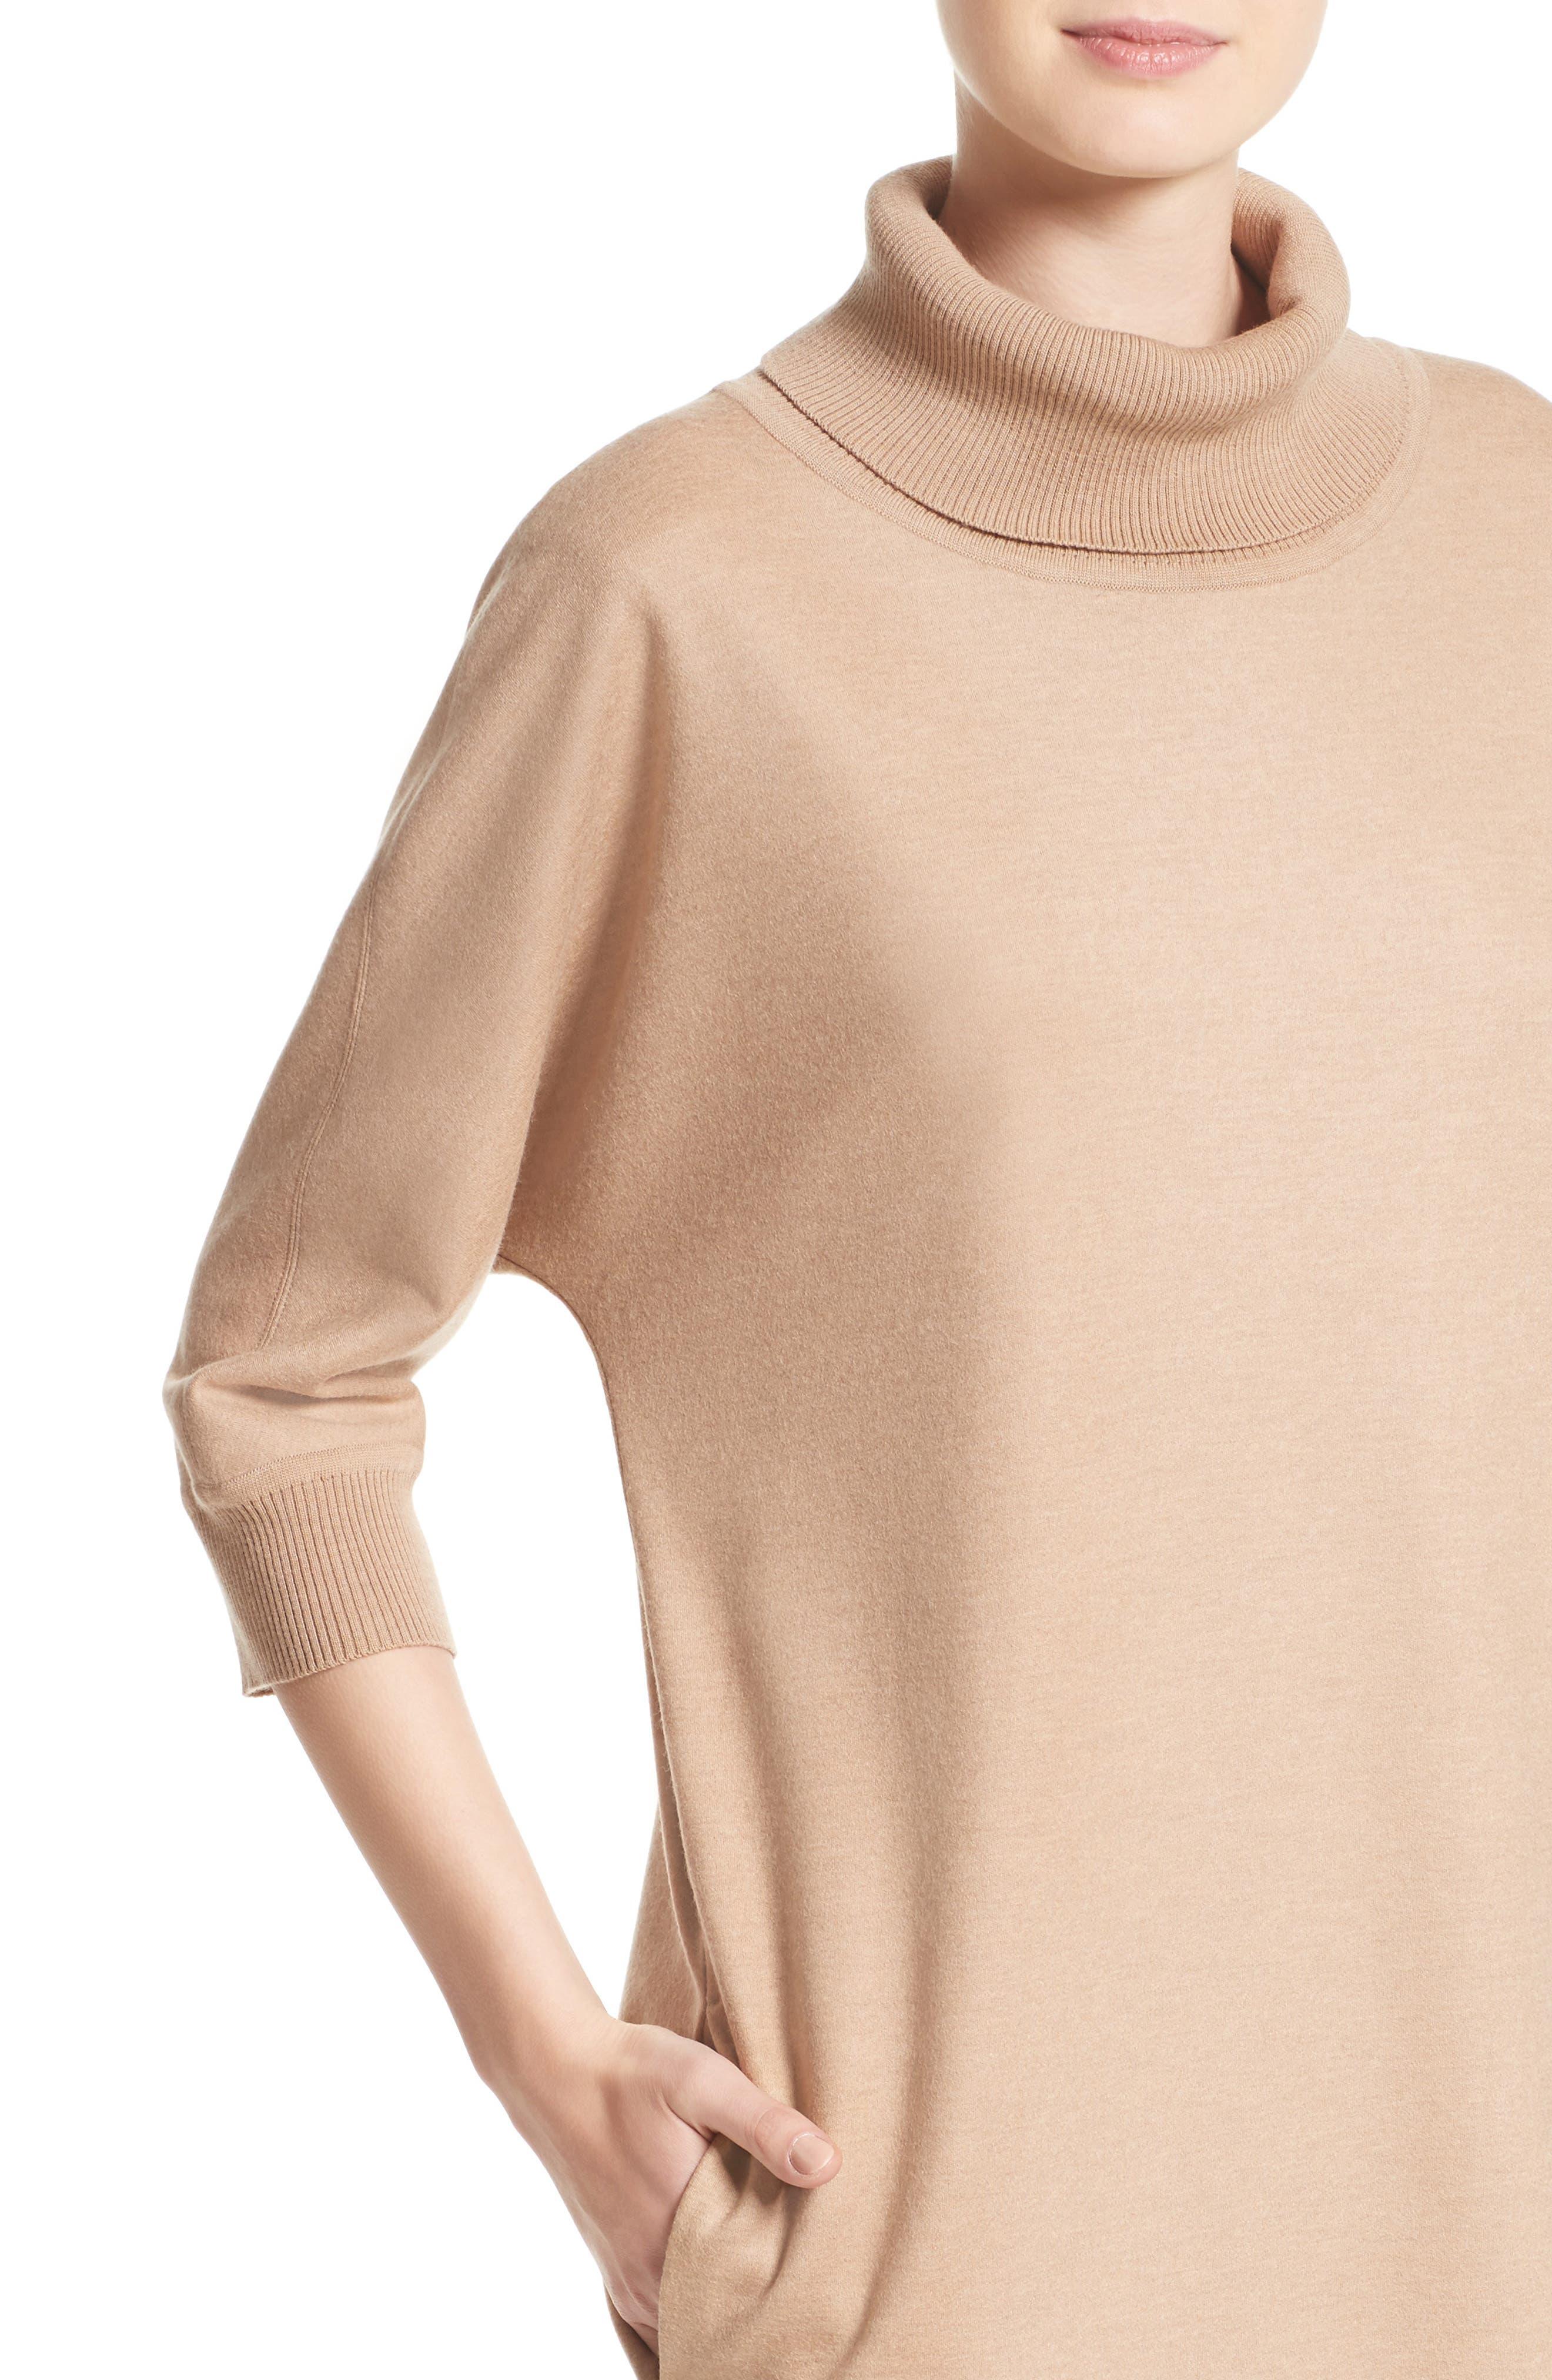 Agro Wool Turtleneck Dress,                             Alternate thumbnail 4, color,                             232